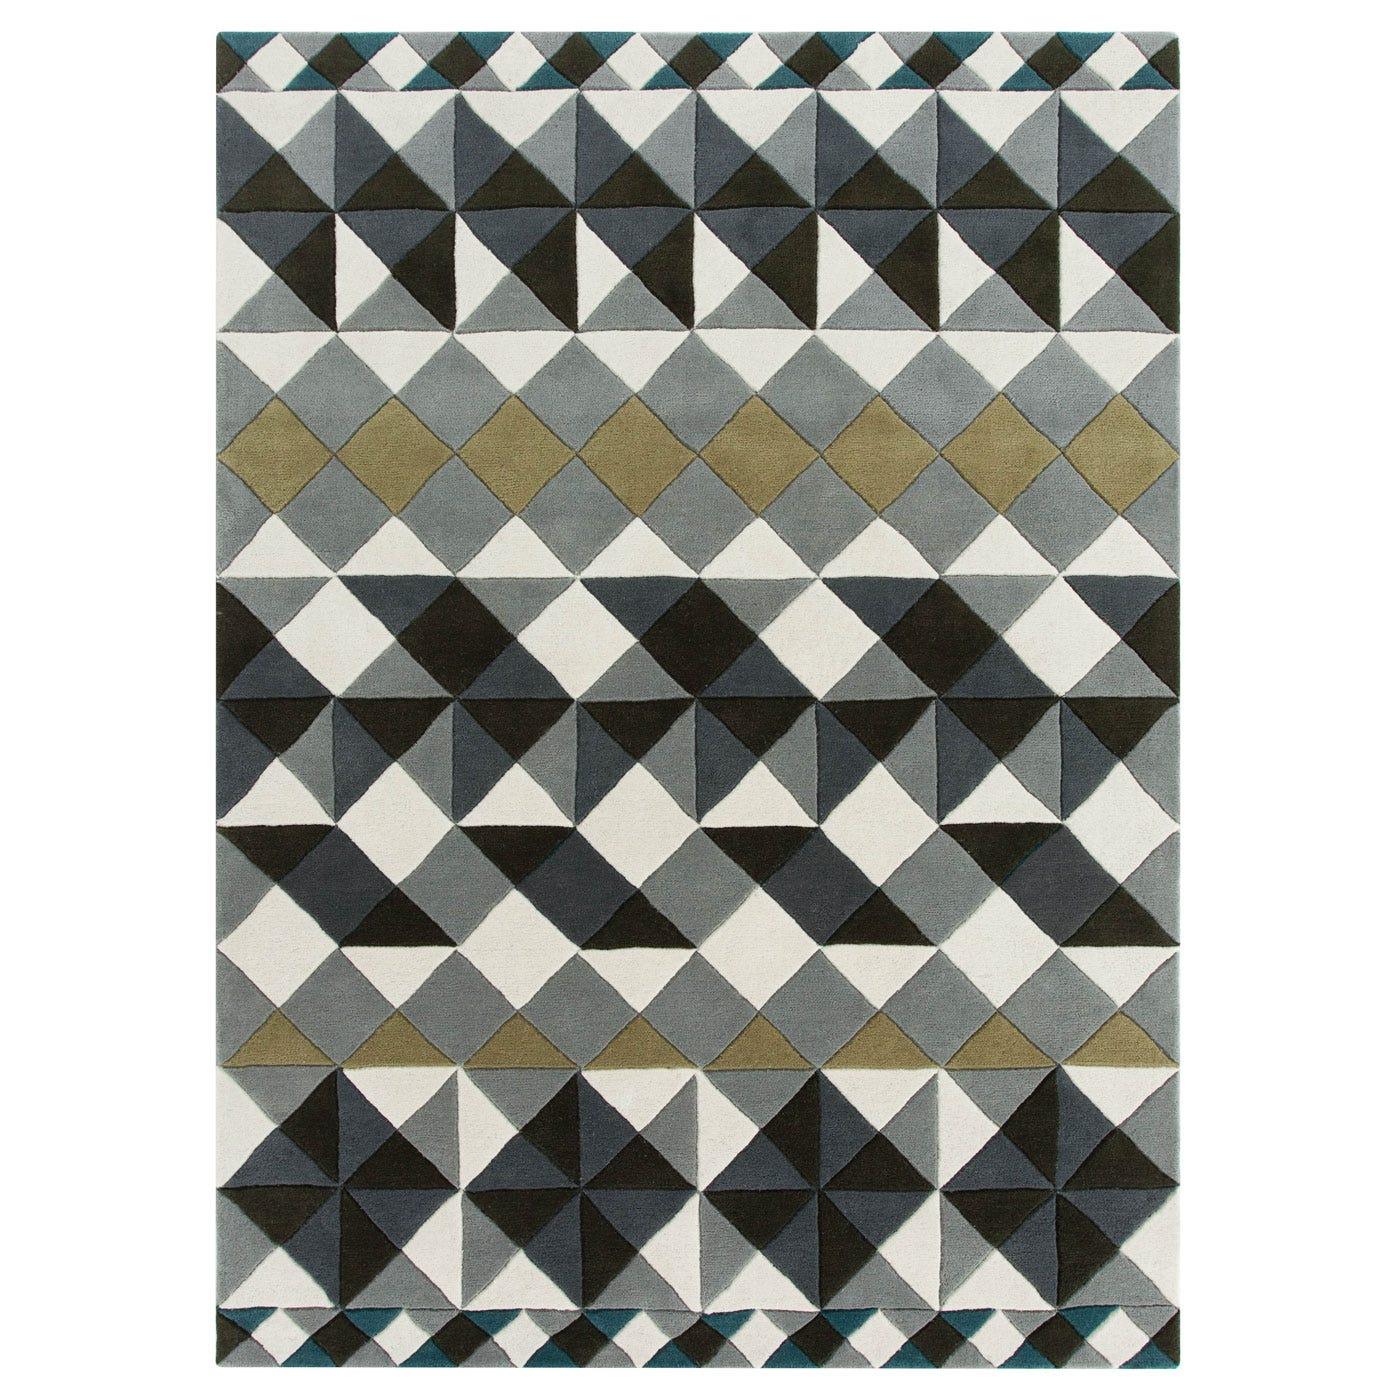 Mosaiek Hand Tufted Rug